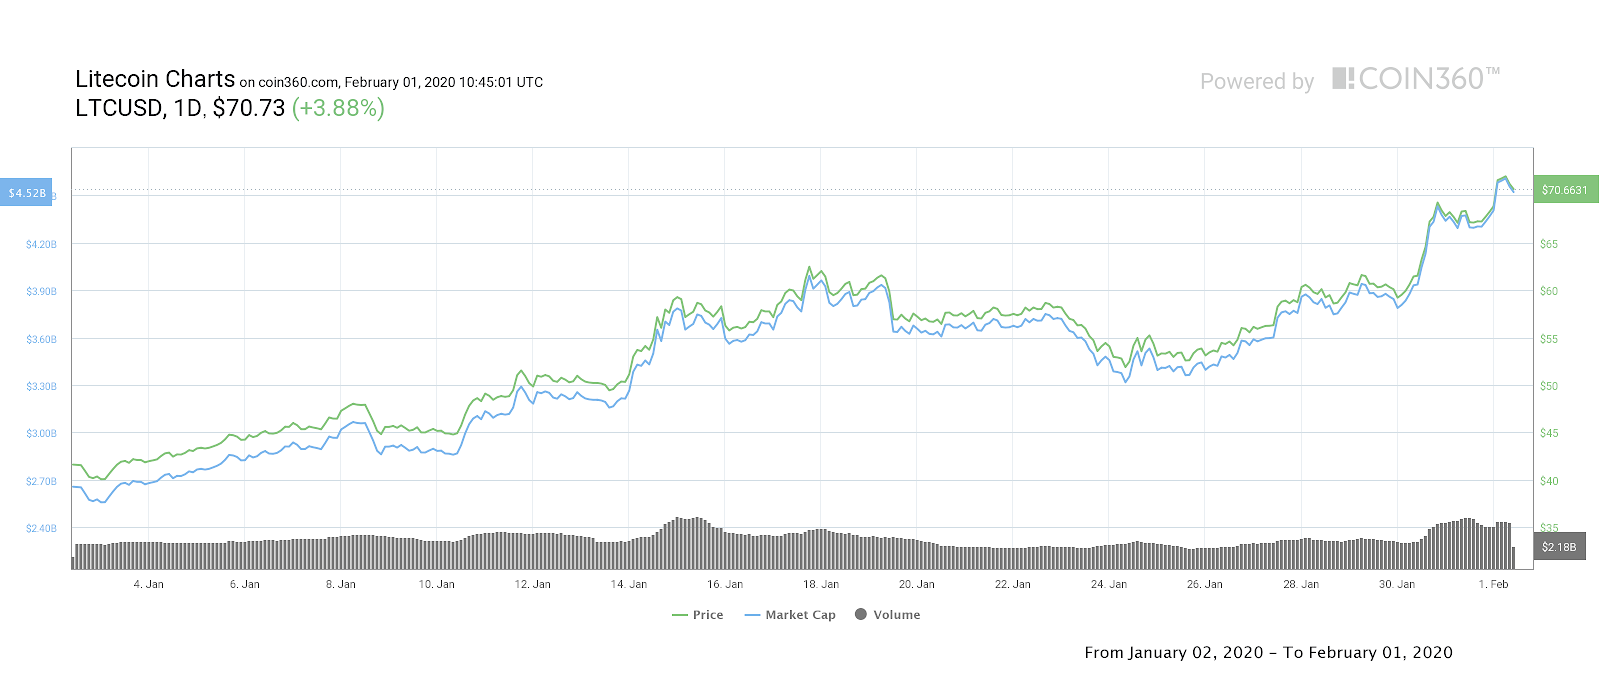 Litecoin price 1-month chart